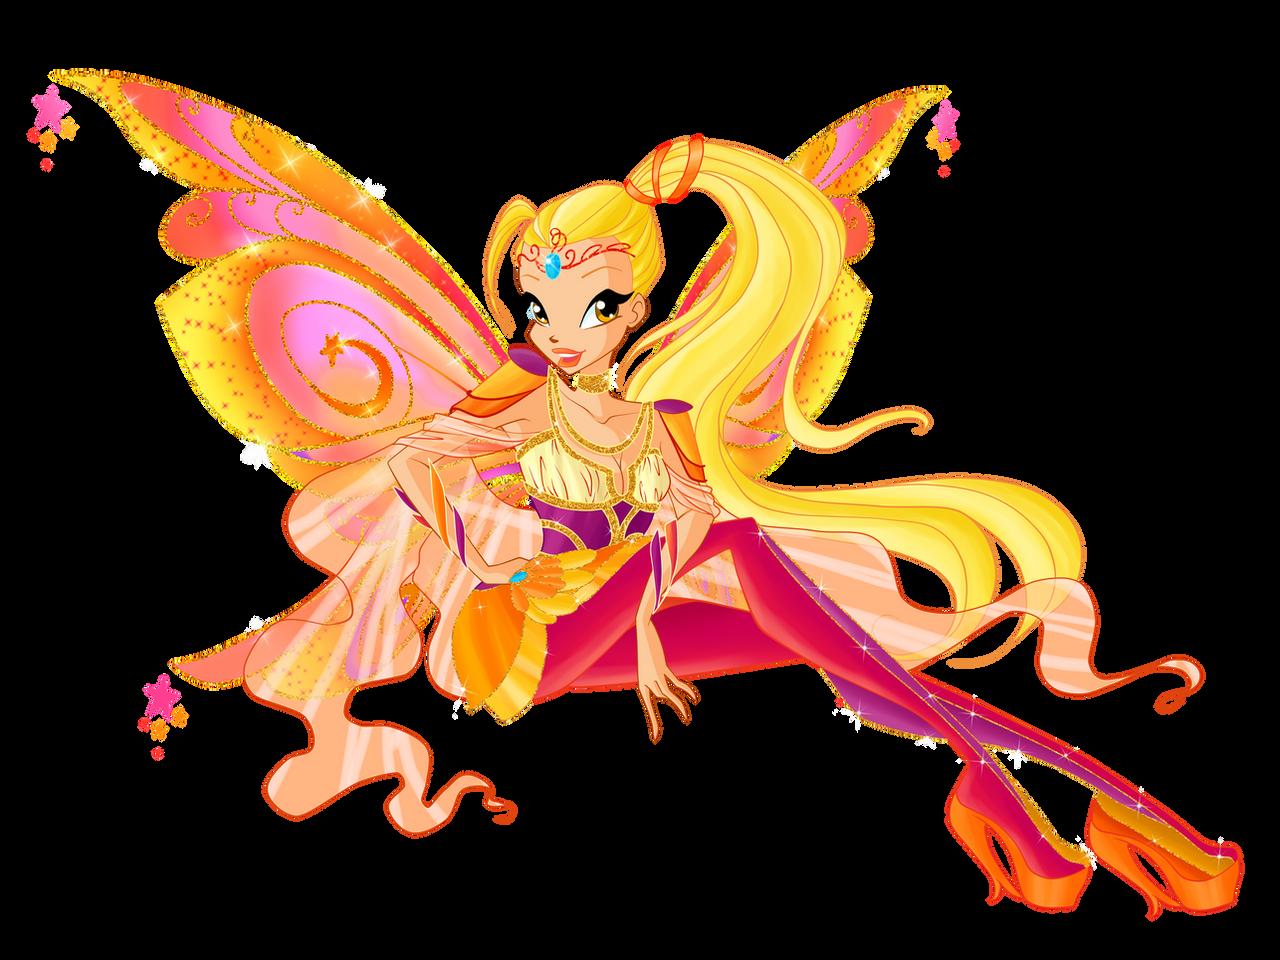 doll poupee muneca figure winx club stella fairy bloomix power no sirenix mythix ebay. Black Bedroom Furniture Sets. Home Design Ideas